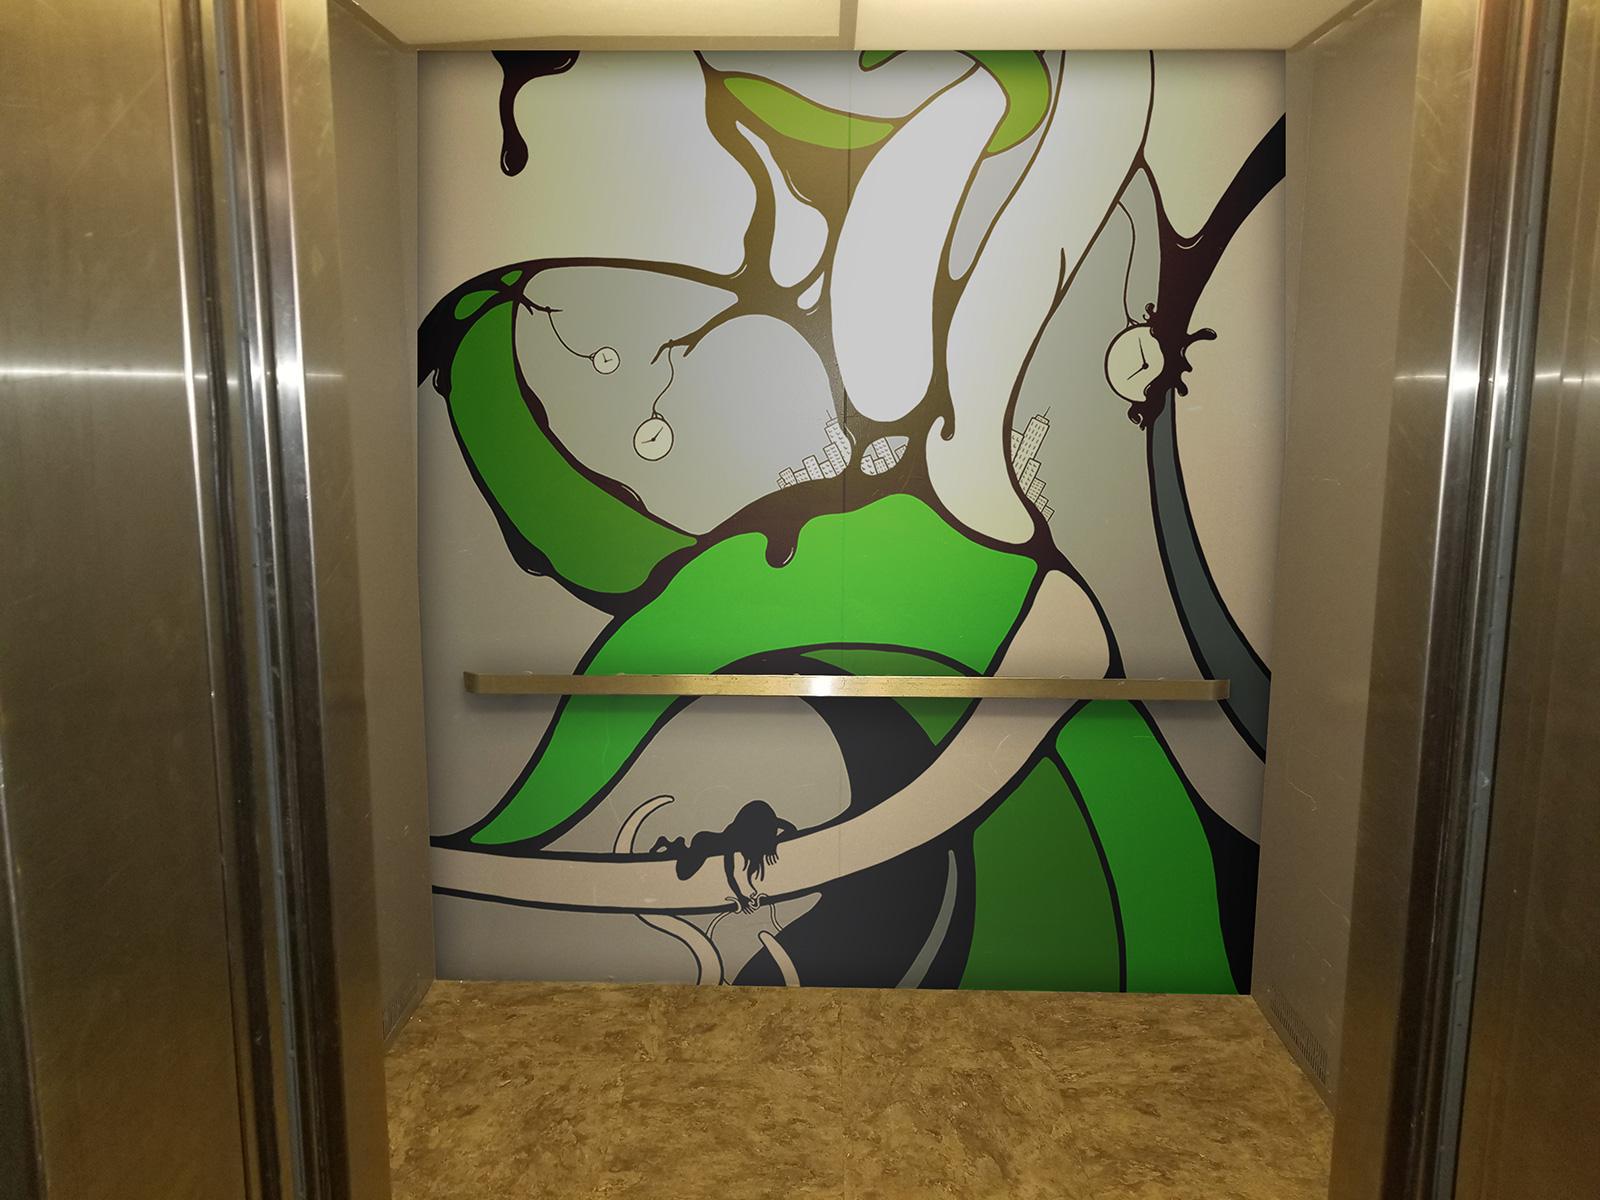 TFL-Elevator-mockup-02